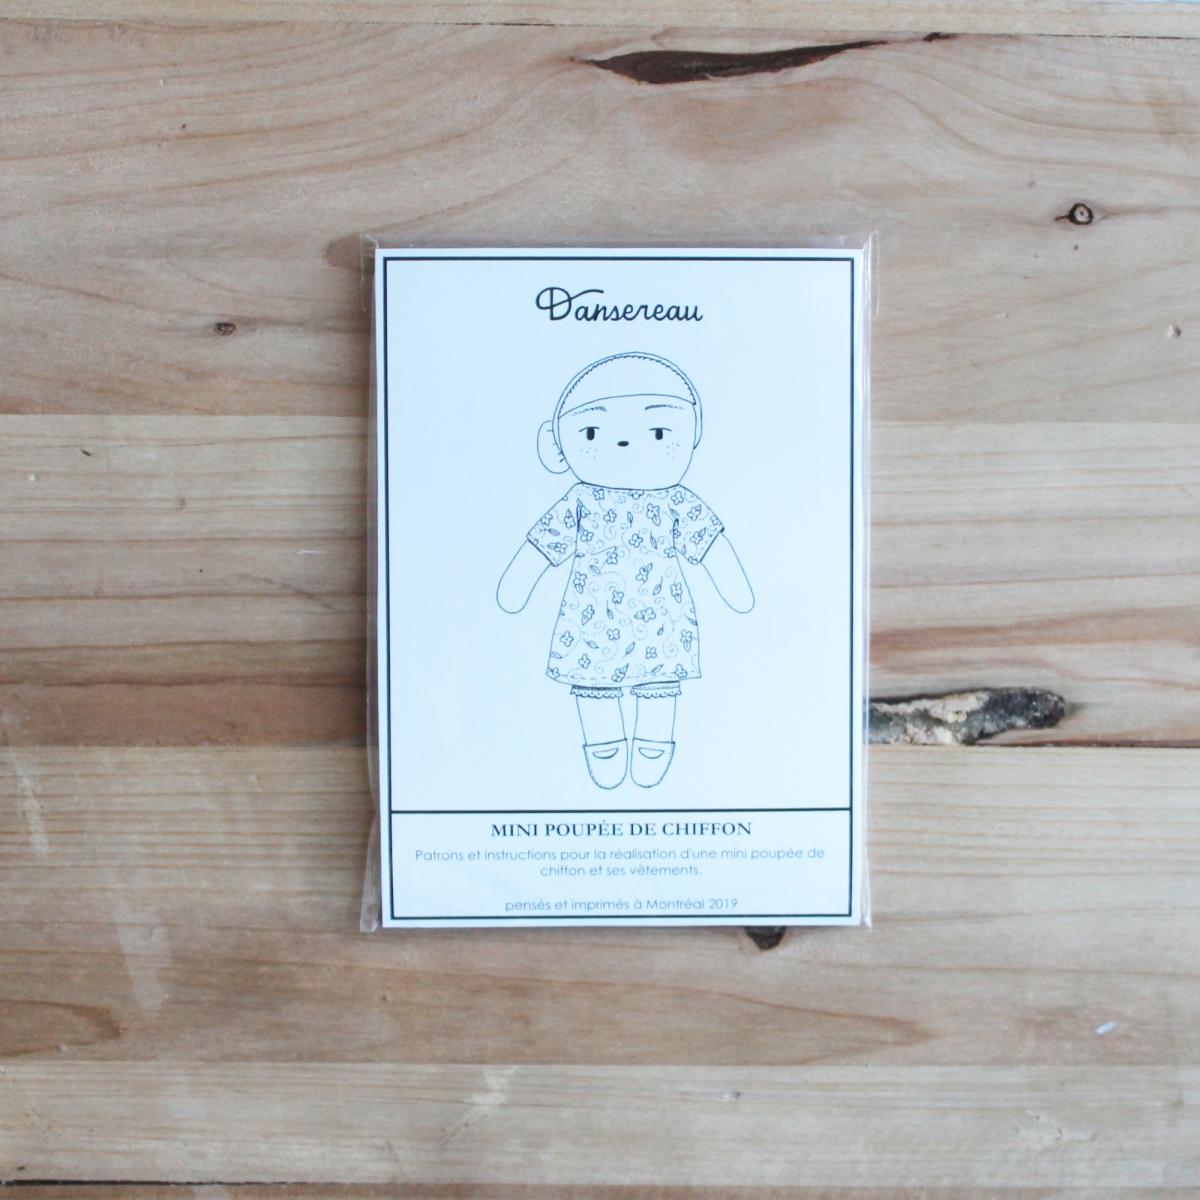 patron no.1 : mini poupée dechiffon